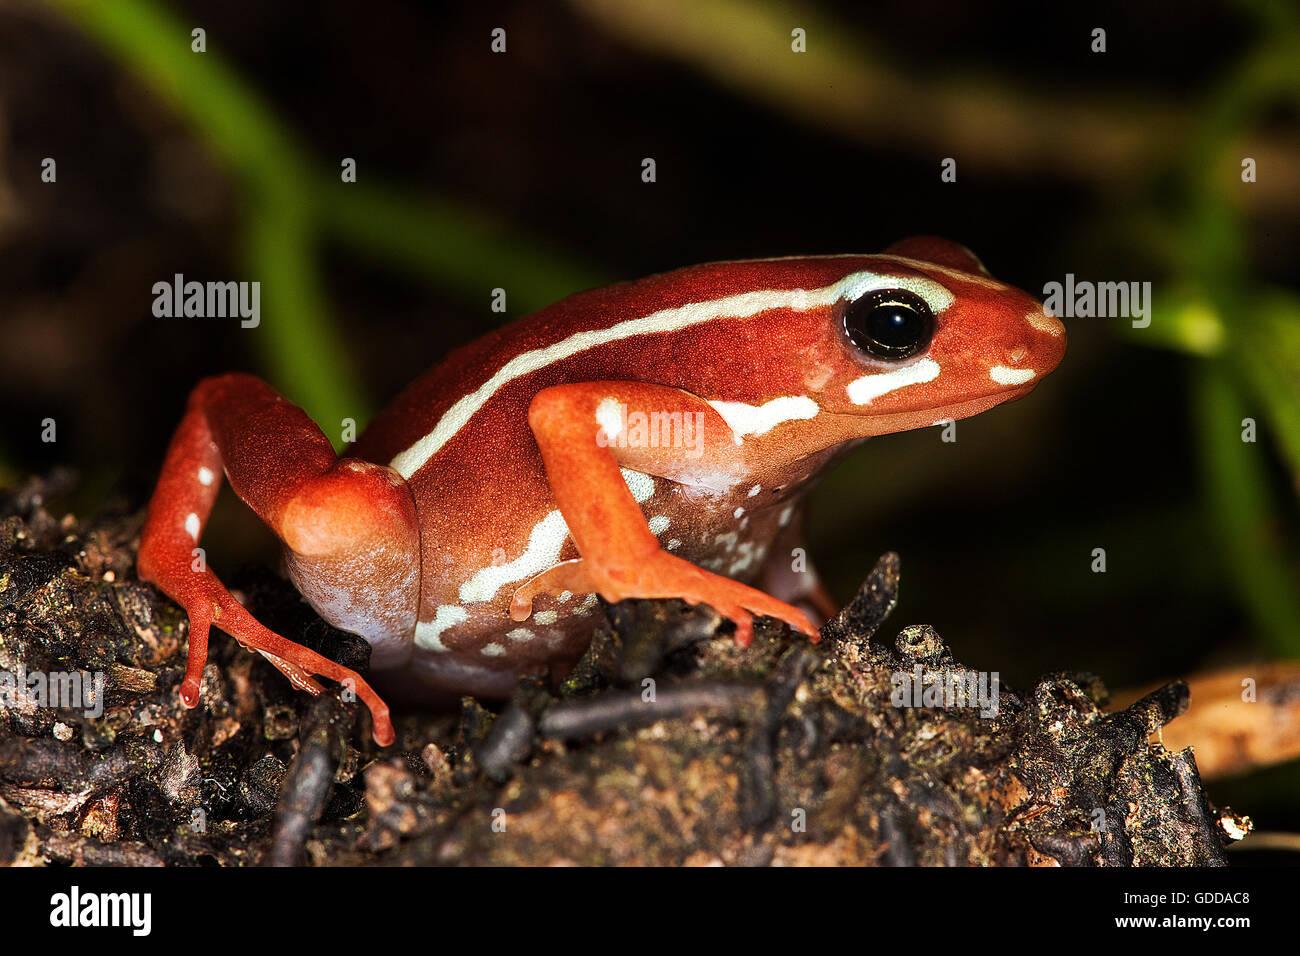 PHANTASMAL POISON FROG epipedobates tricolor, ADULT - Stock Image